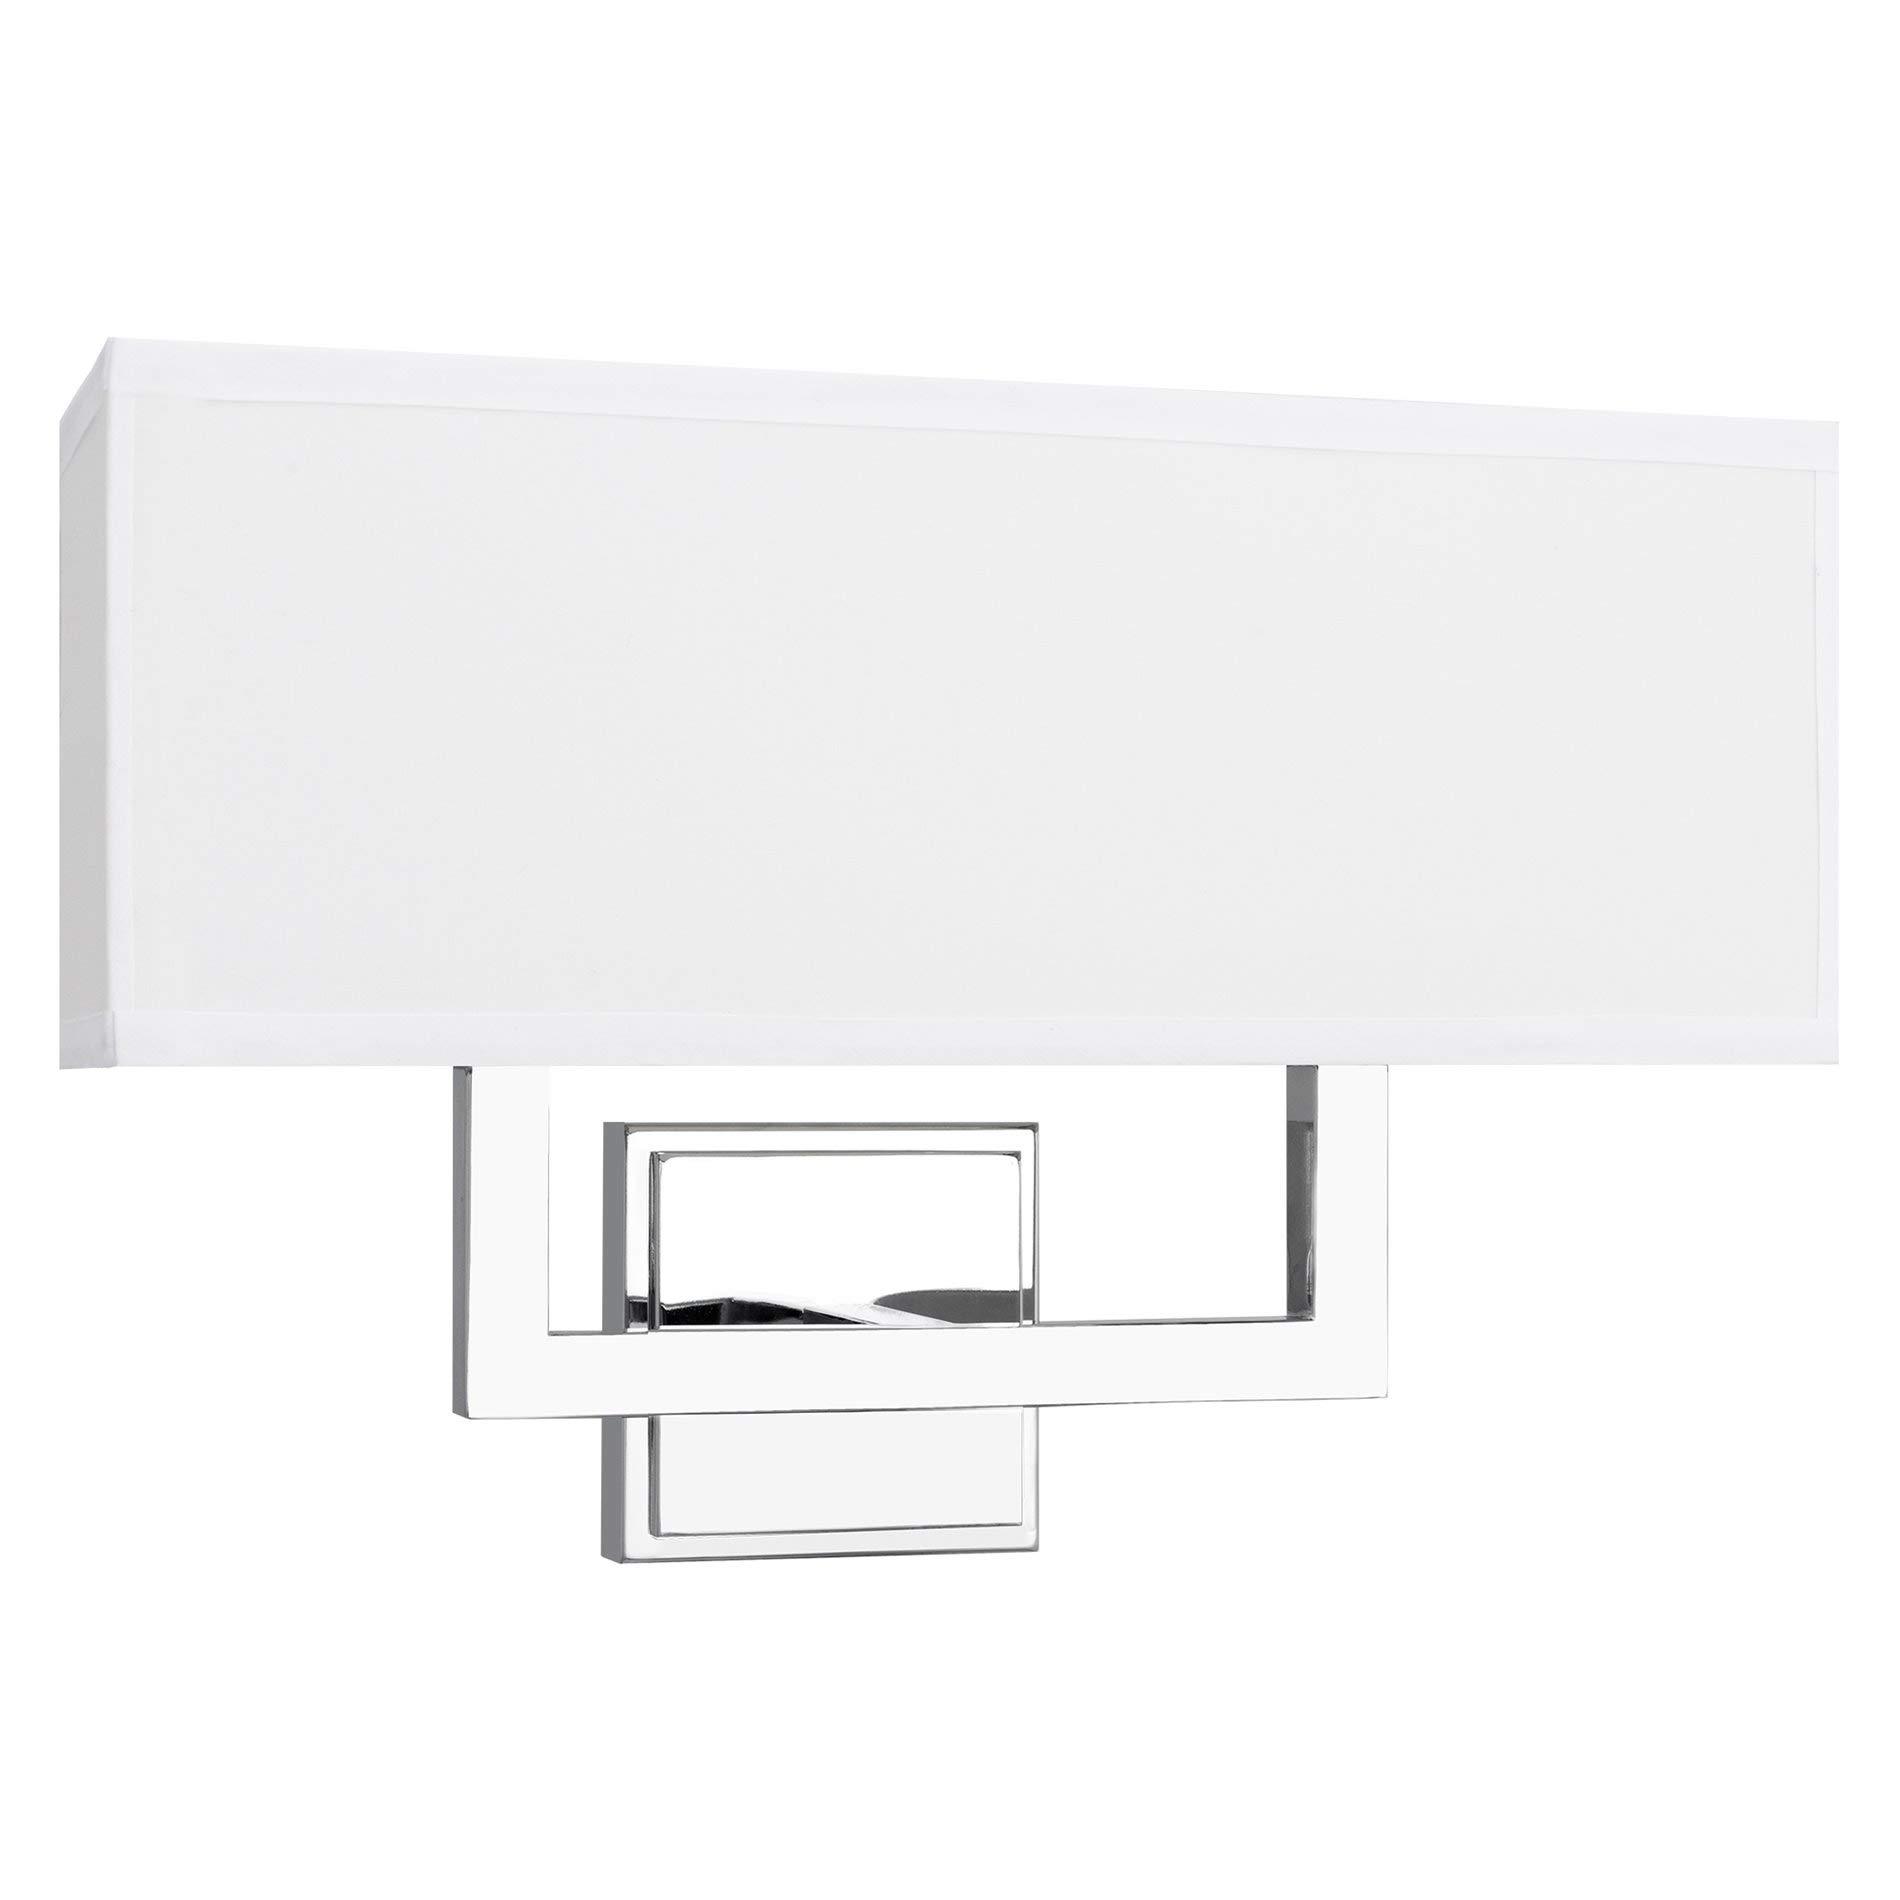 Kira Home Haven 16'' Modern 2-Light Wall Sconce/Wall Light + Rectangular White Fabric Shade, Chrome Finish